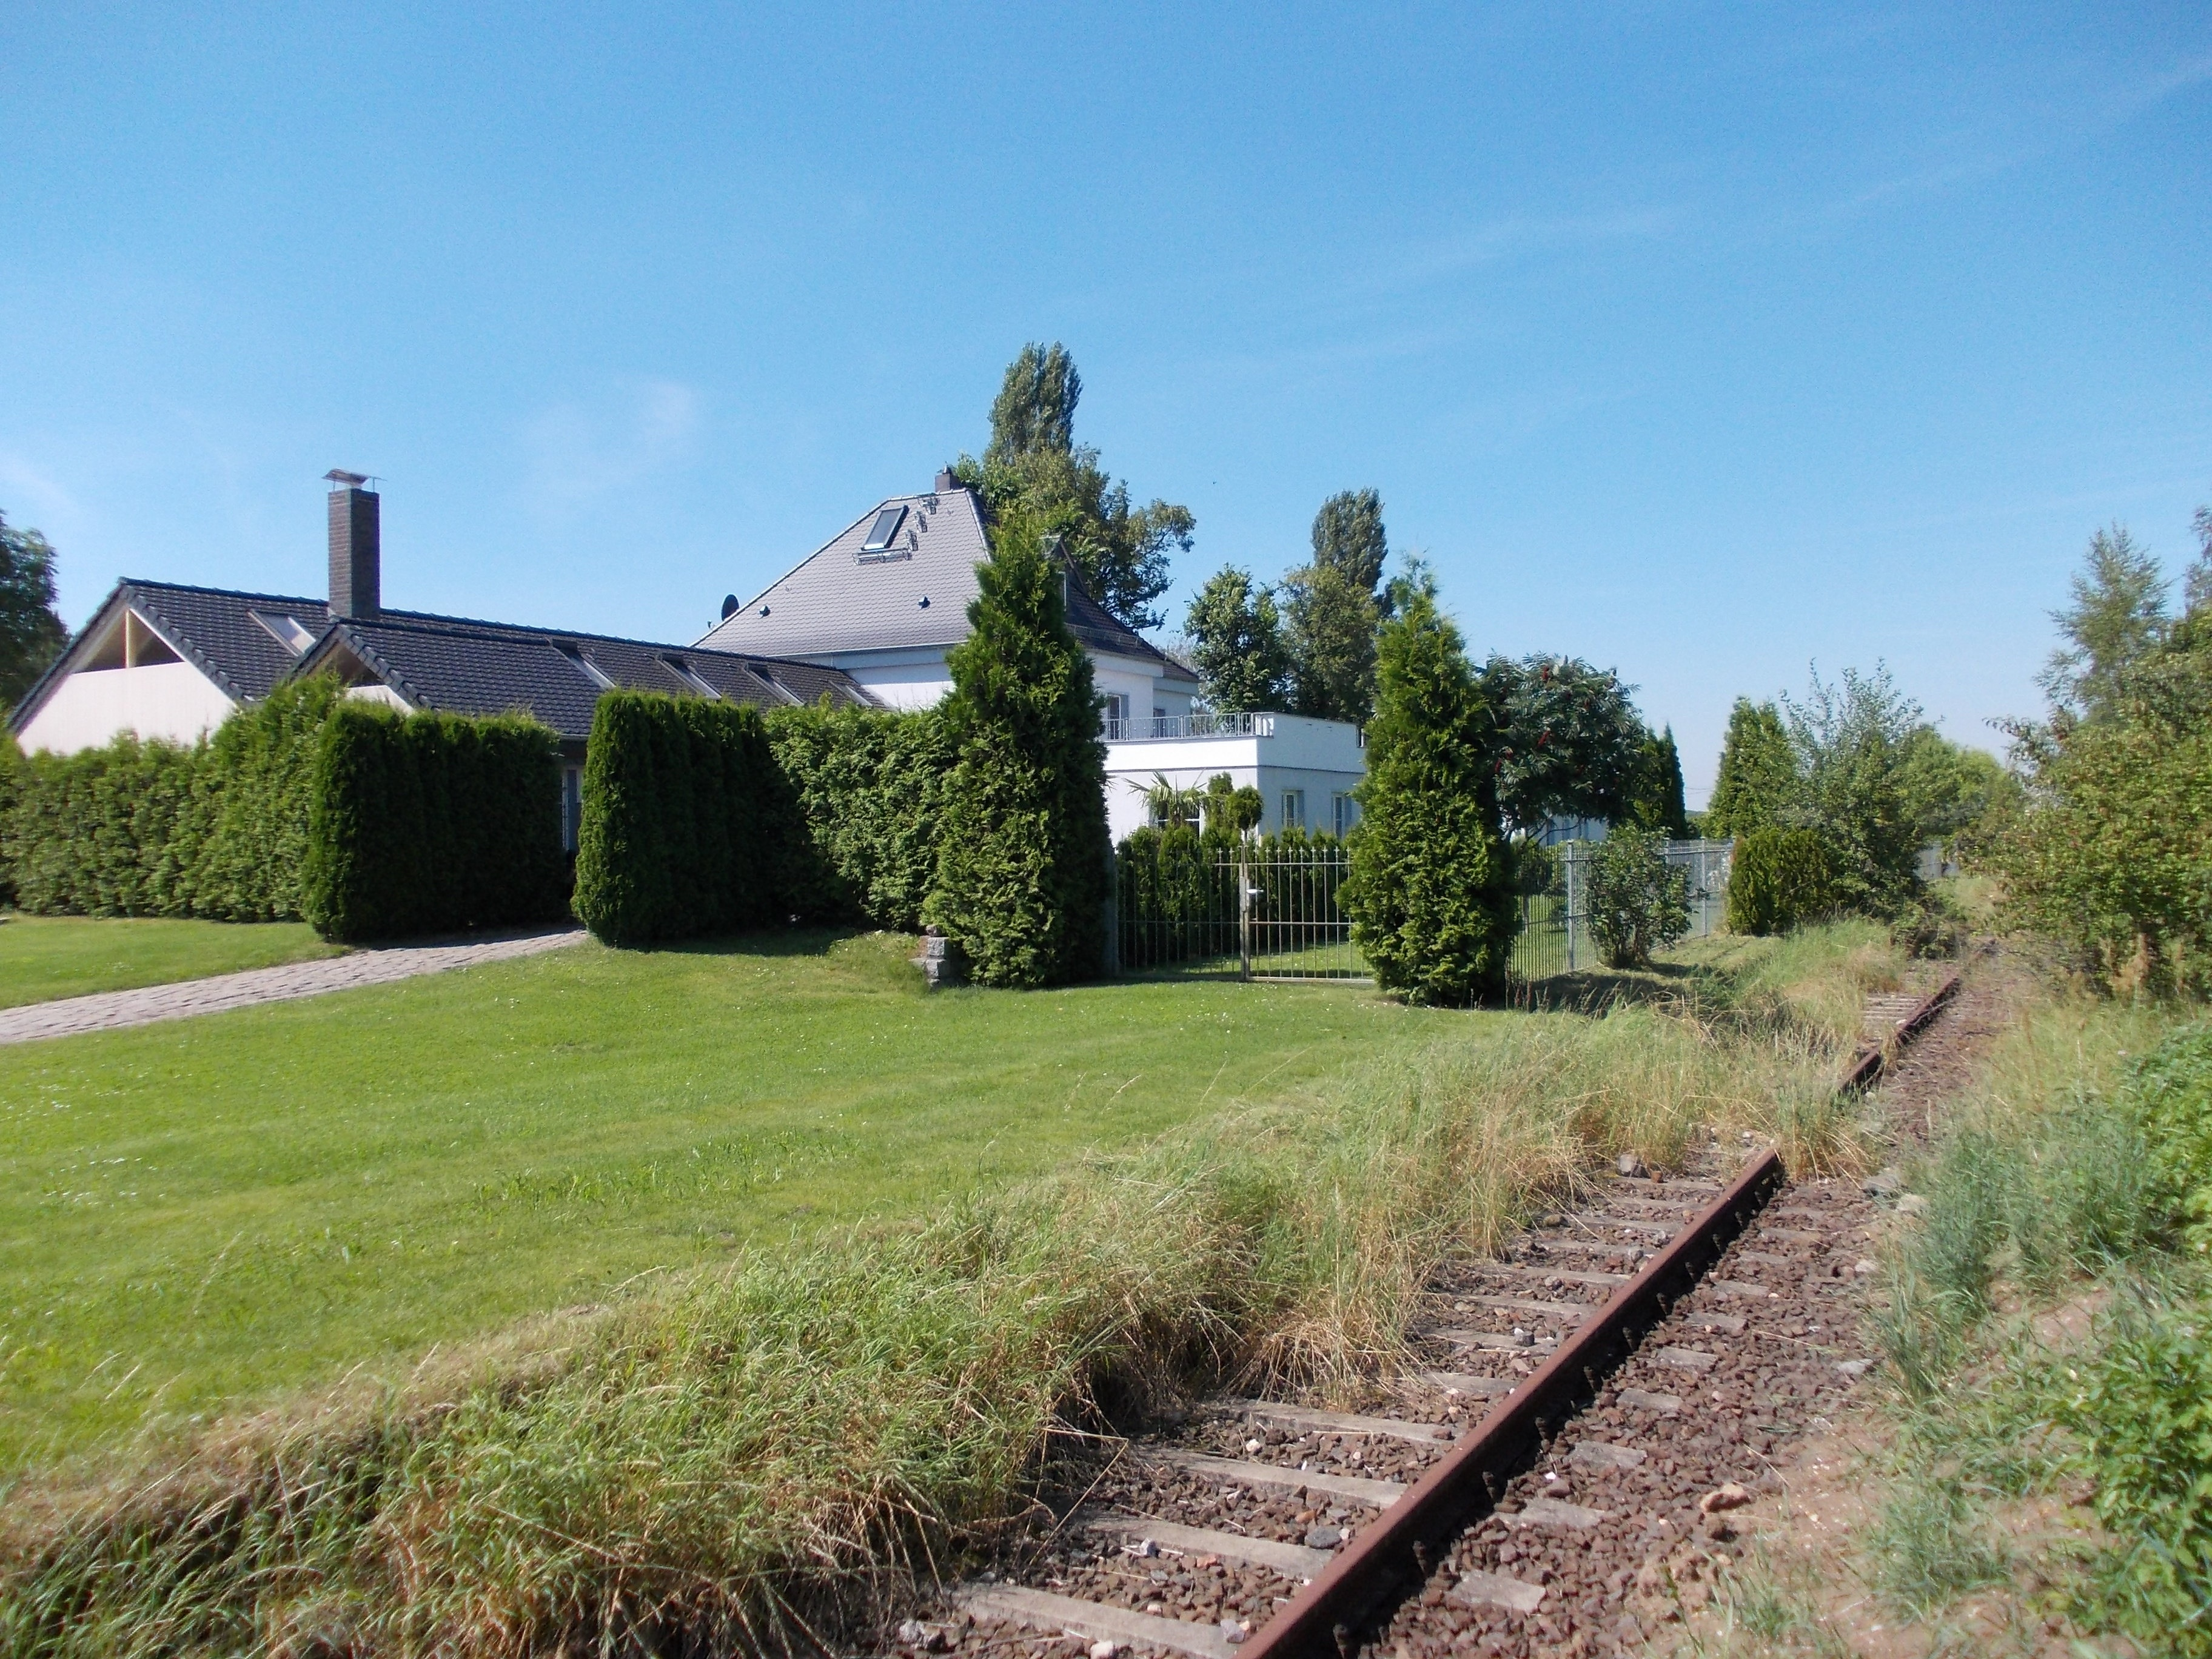 Doelzig, Schkeuditz, Saxony, Germany